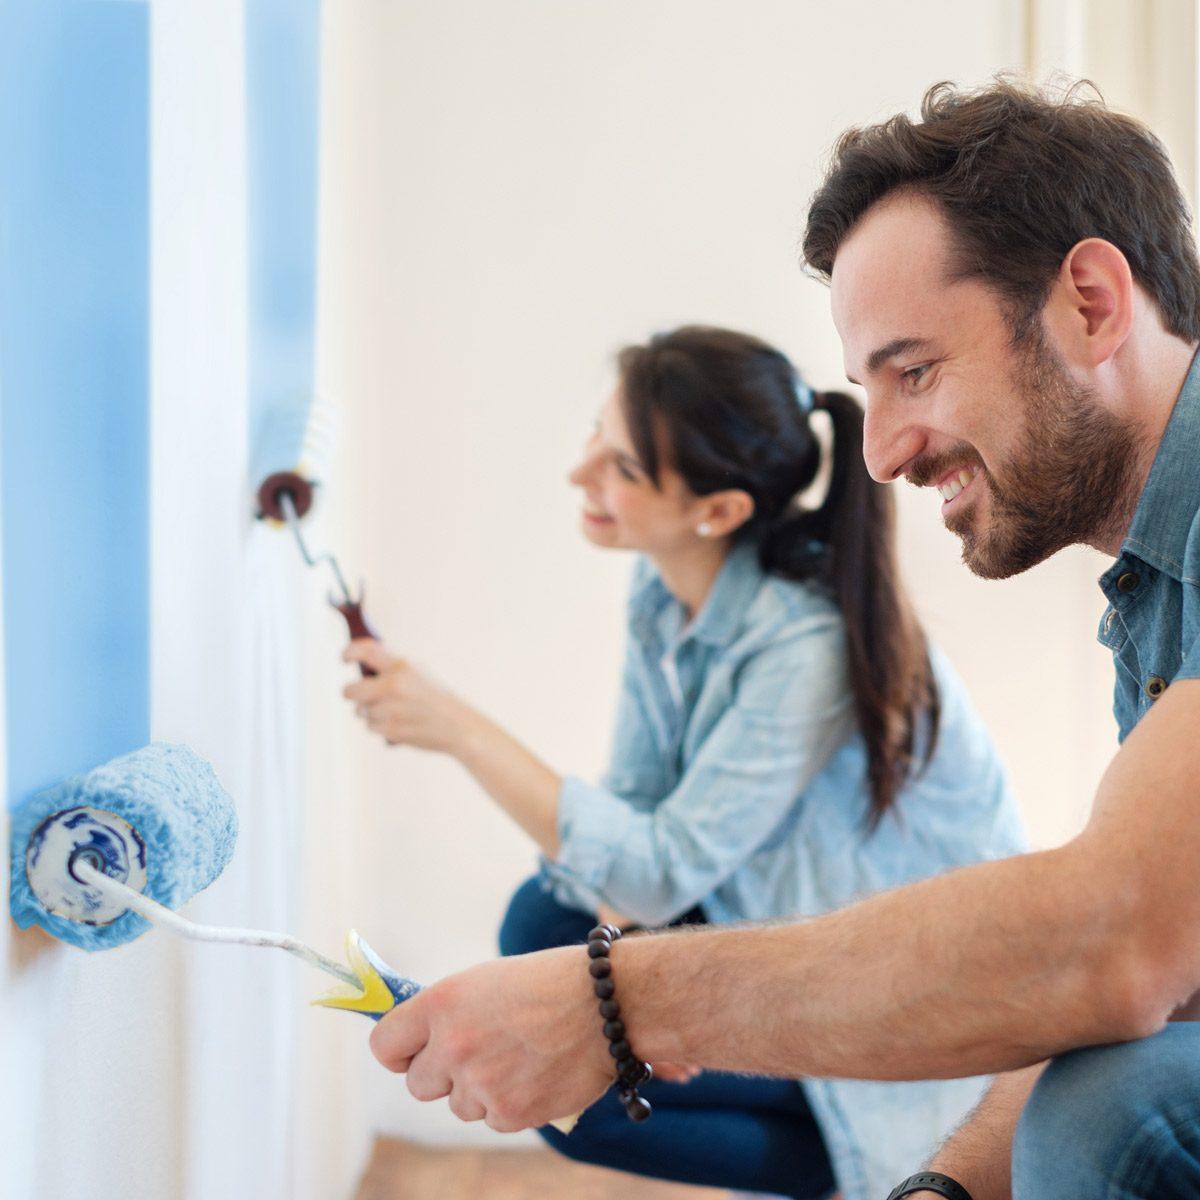 KILZ sponsored painting priming walls